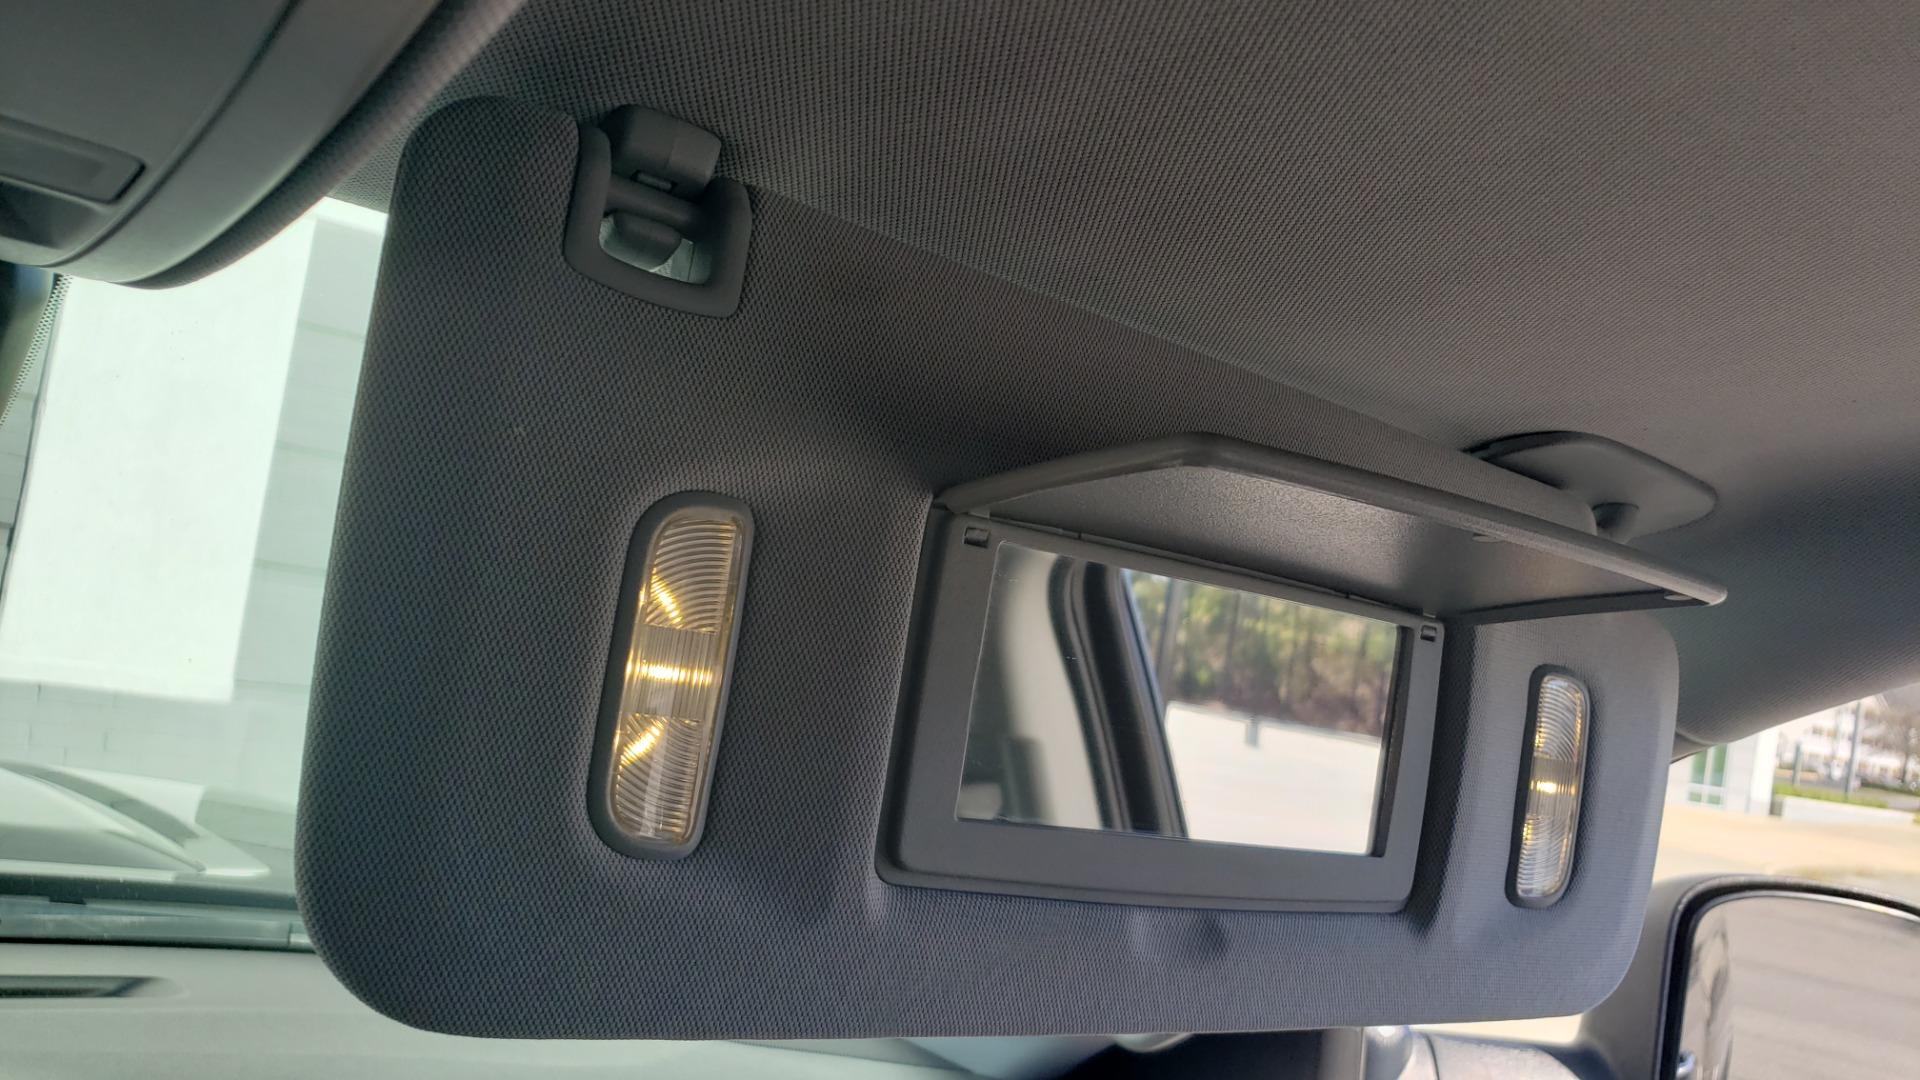 Used 2015 GMC SIERRA 2500HD DENALI 4WD CREWCAB / 6.6L DURAMAX / 6-SPD AUTO / NAV / BOSE for sale $50,995 at Formula Imports in Charlotte NC 28227 63